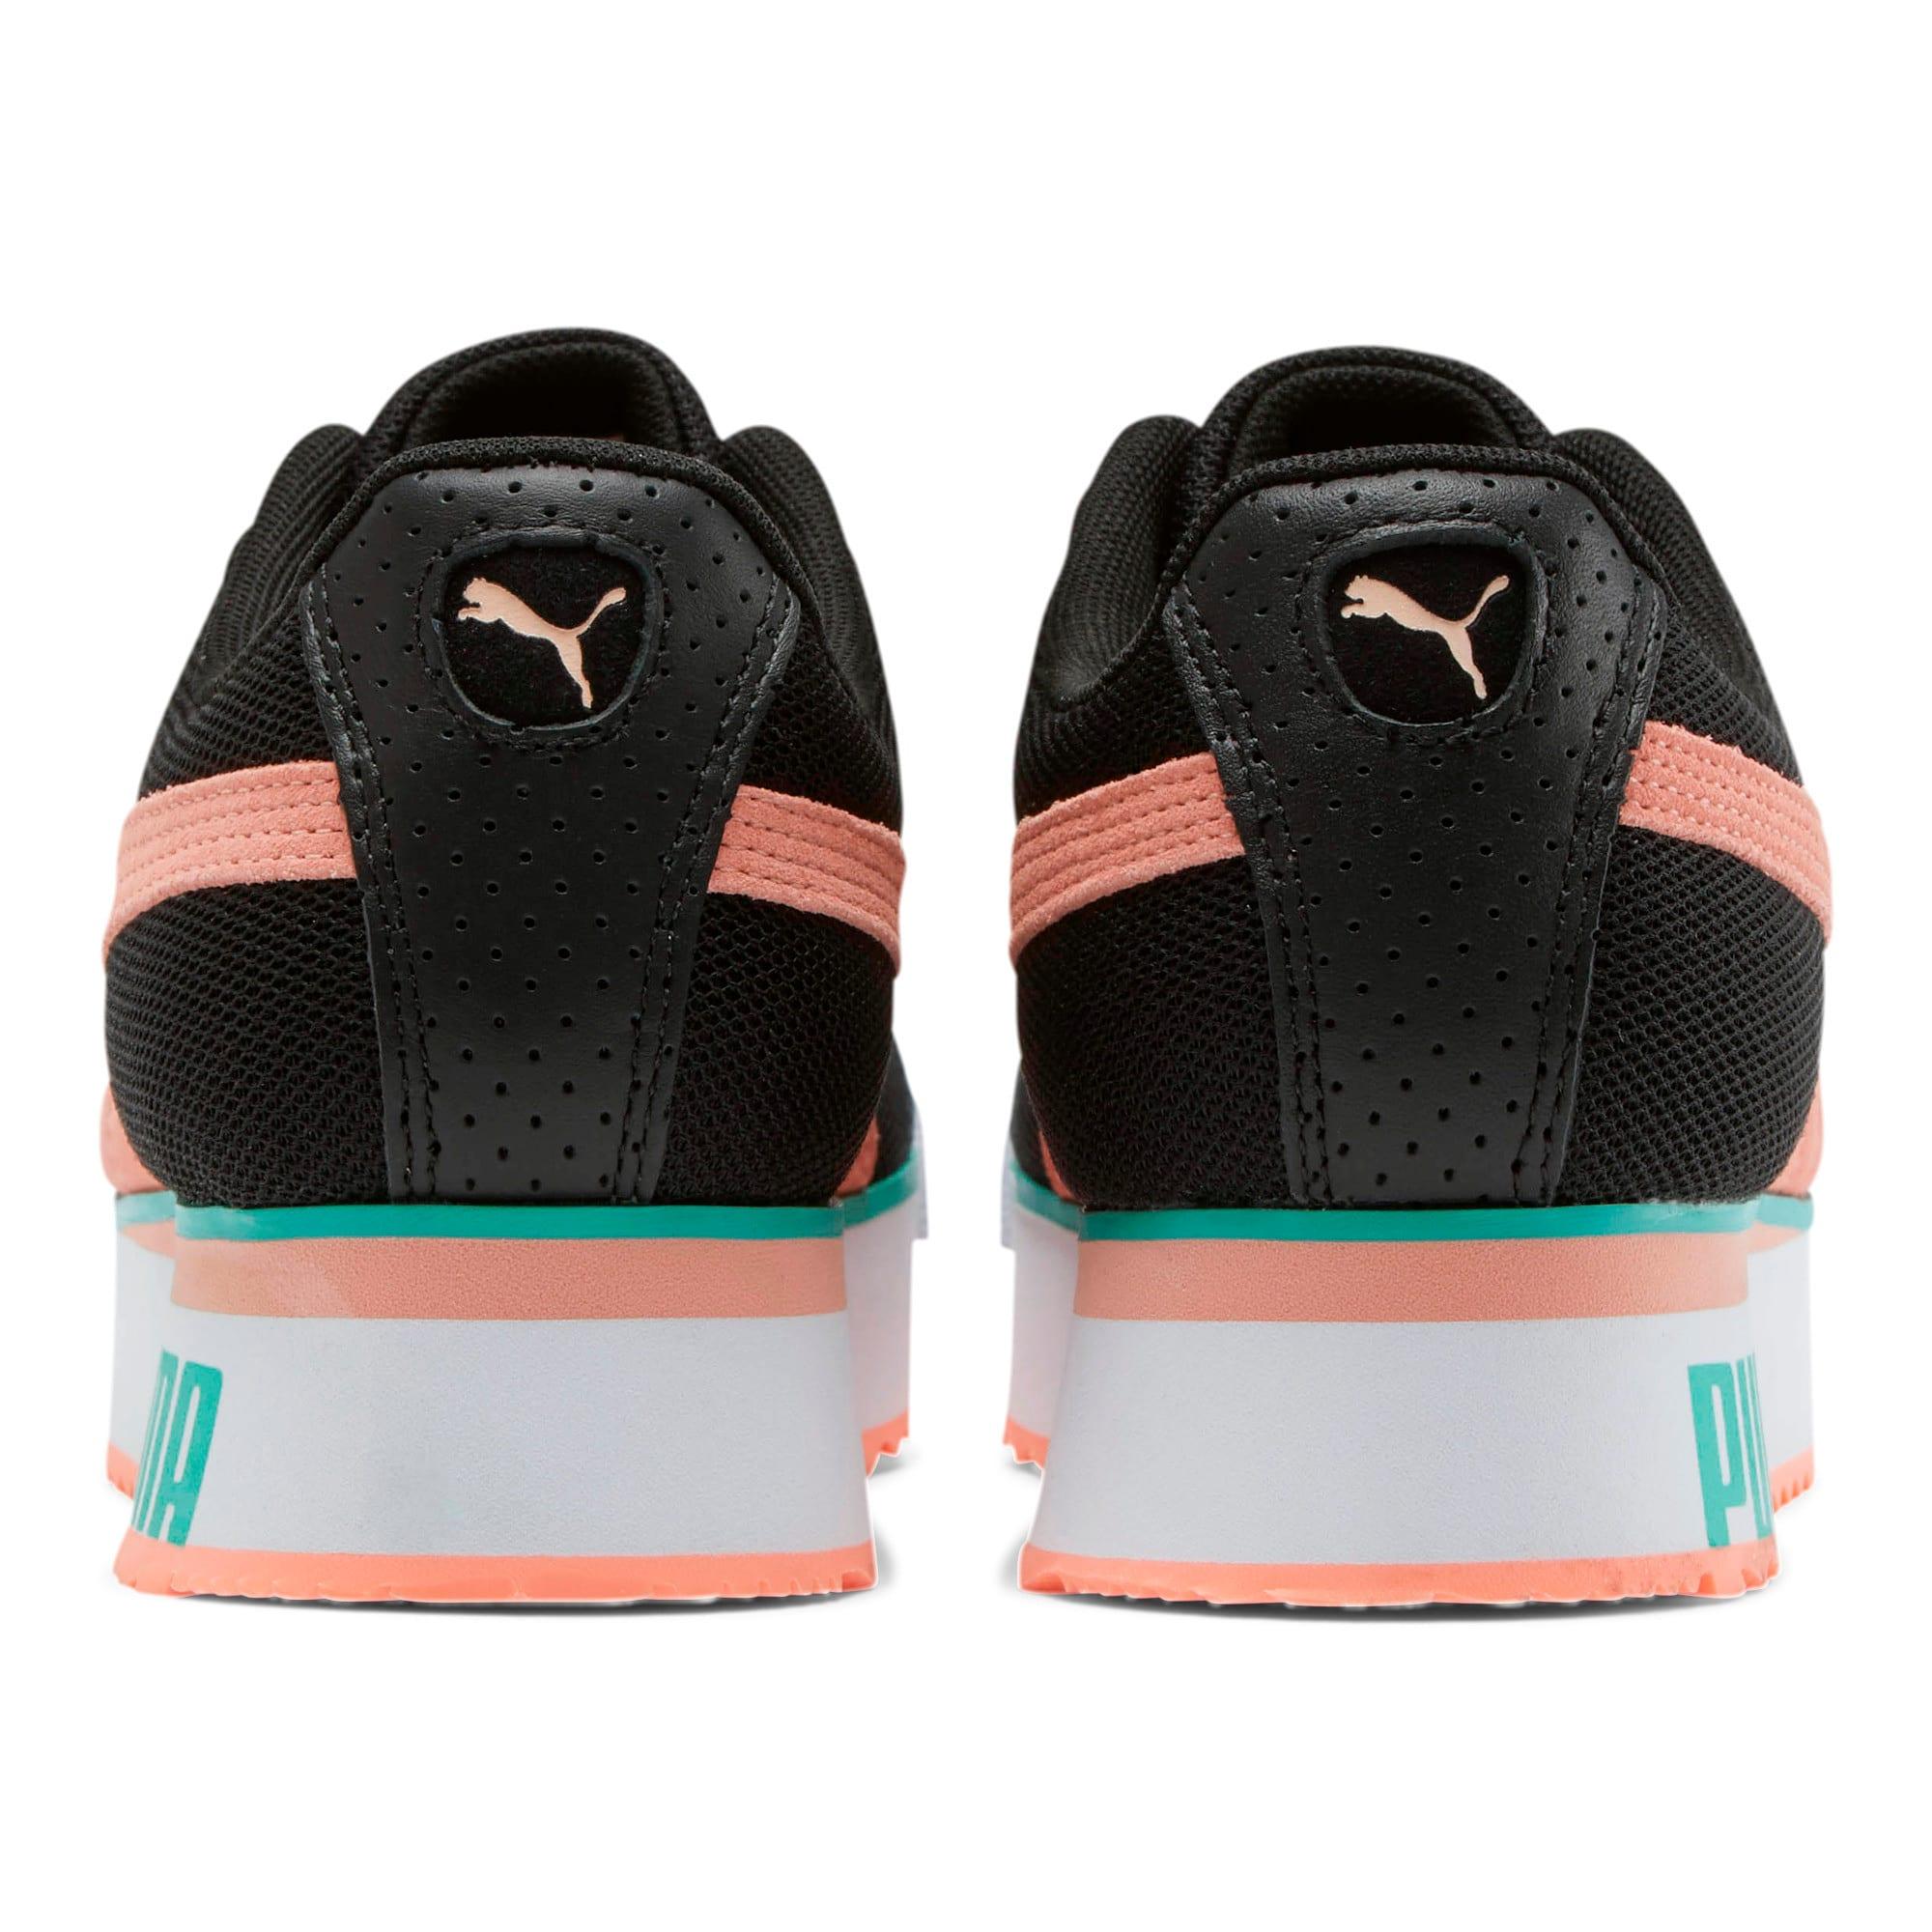 Thumbnail 3 of Roma Amor Mesh Mix Women's Sneakers, Black-Br Peach-Ble Turquoise, medium